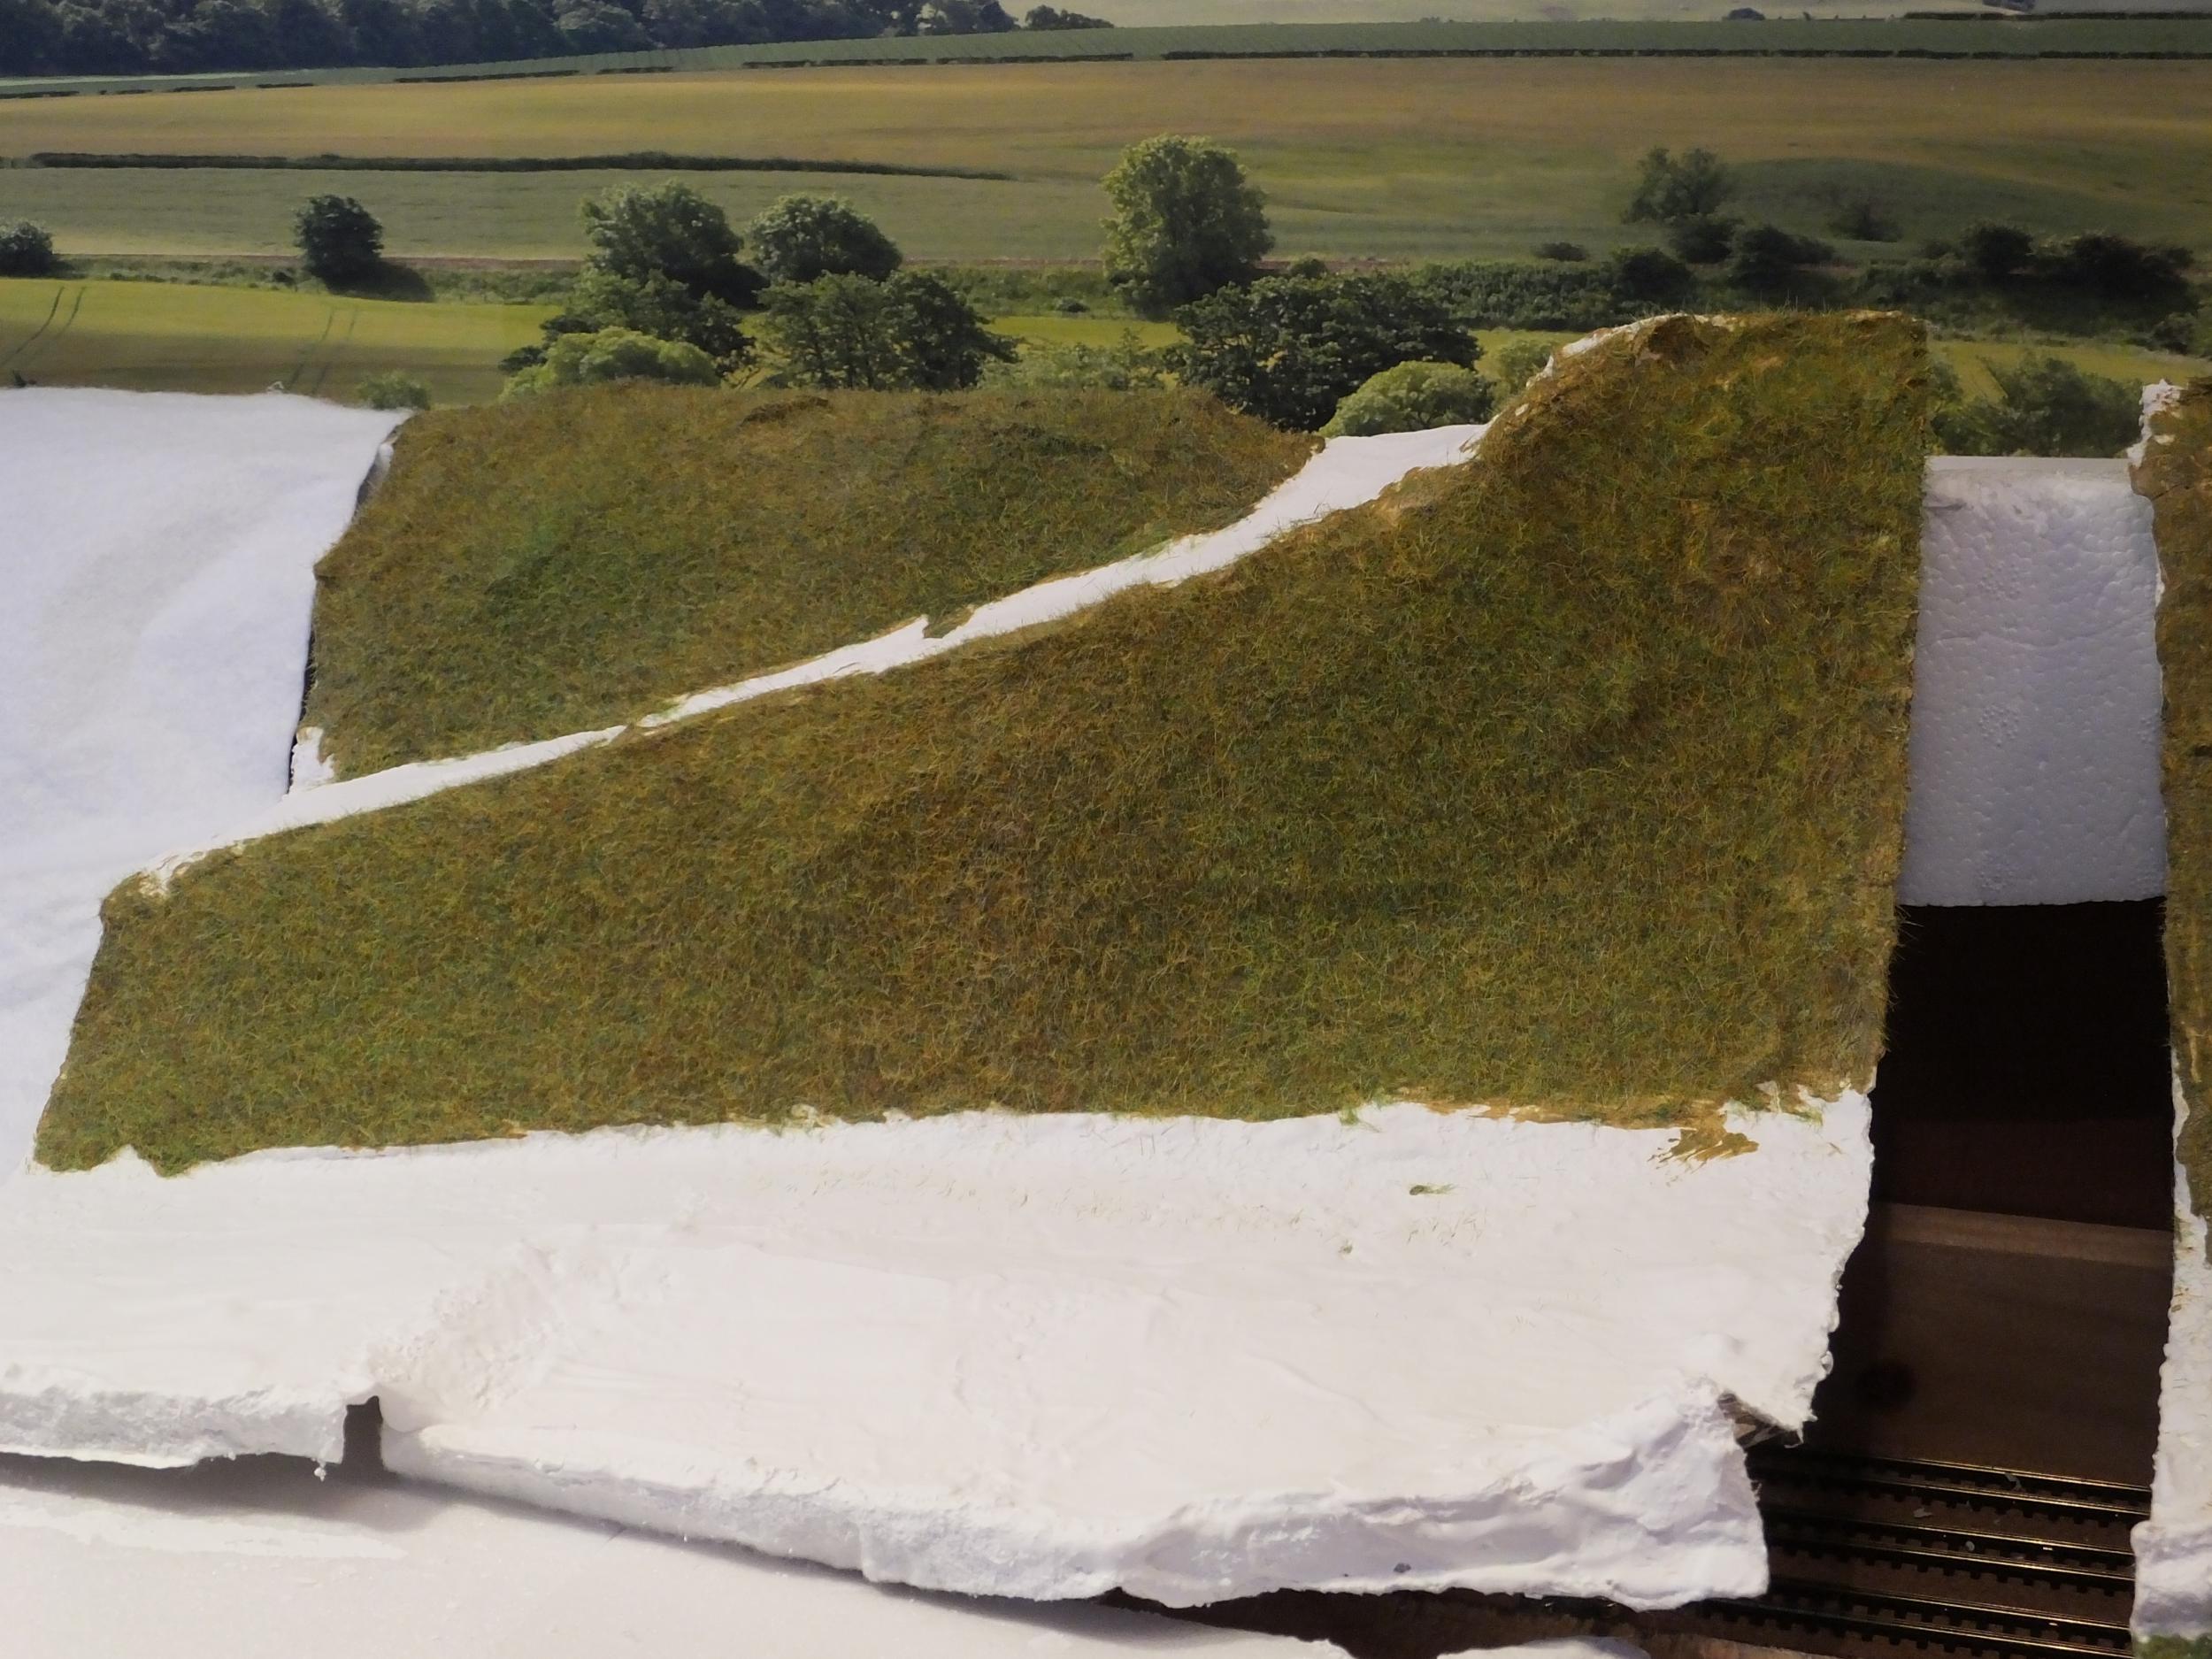 Shaper Sheet From Woodland Scenics